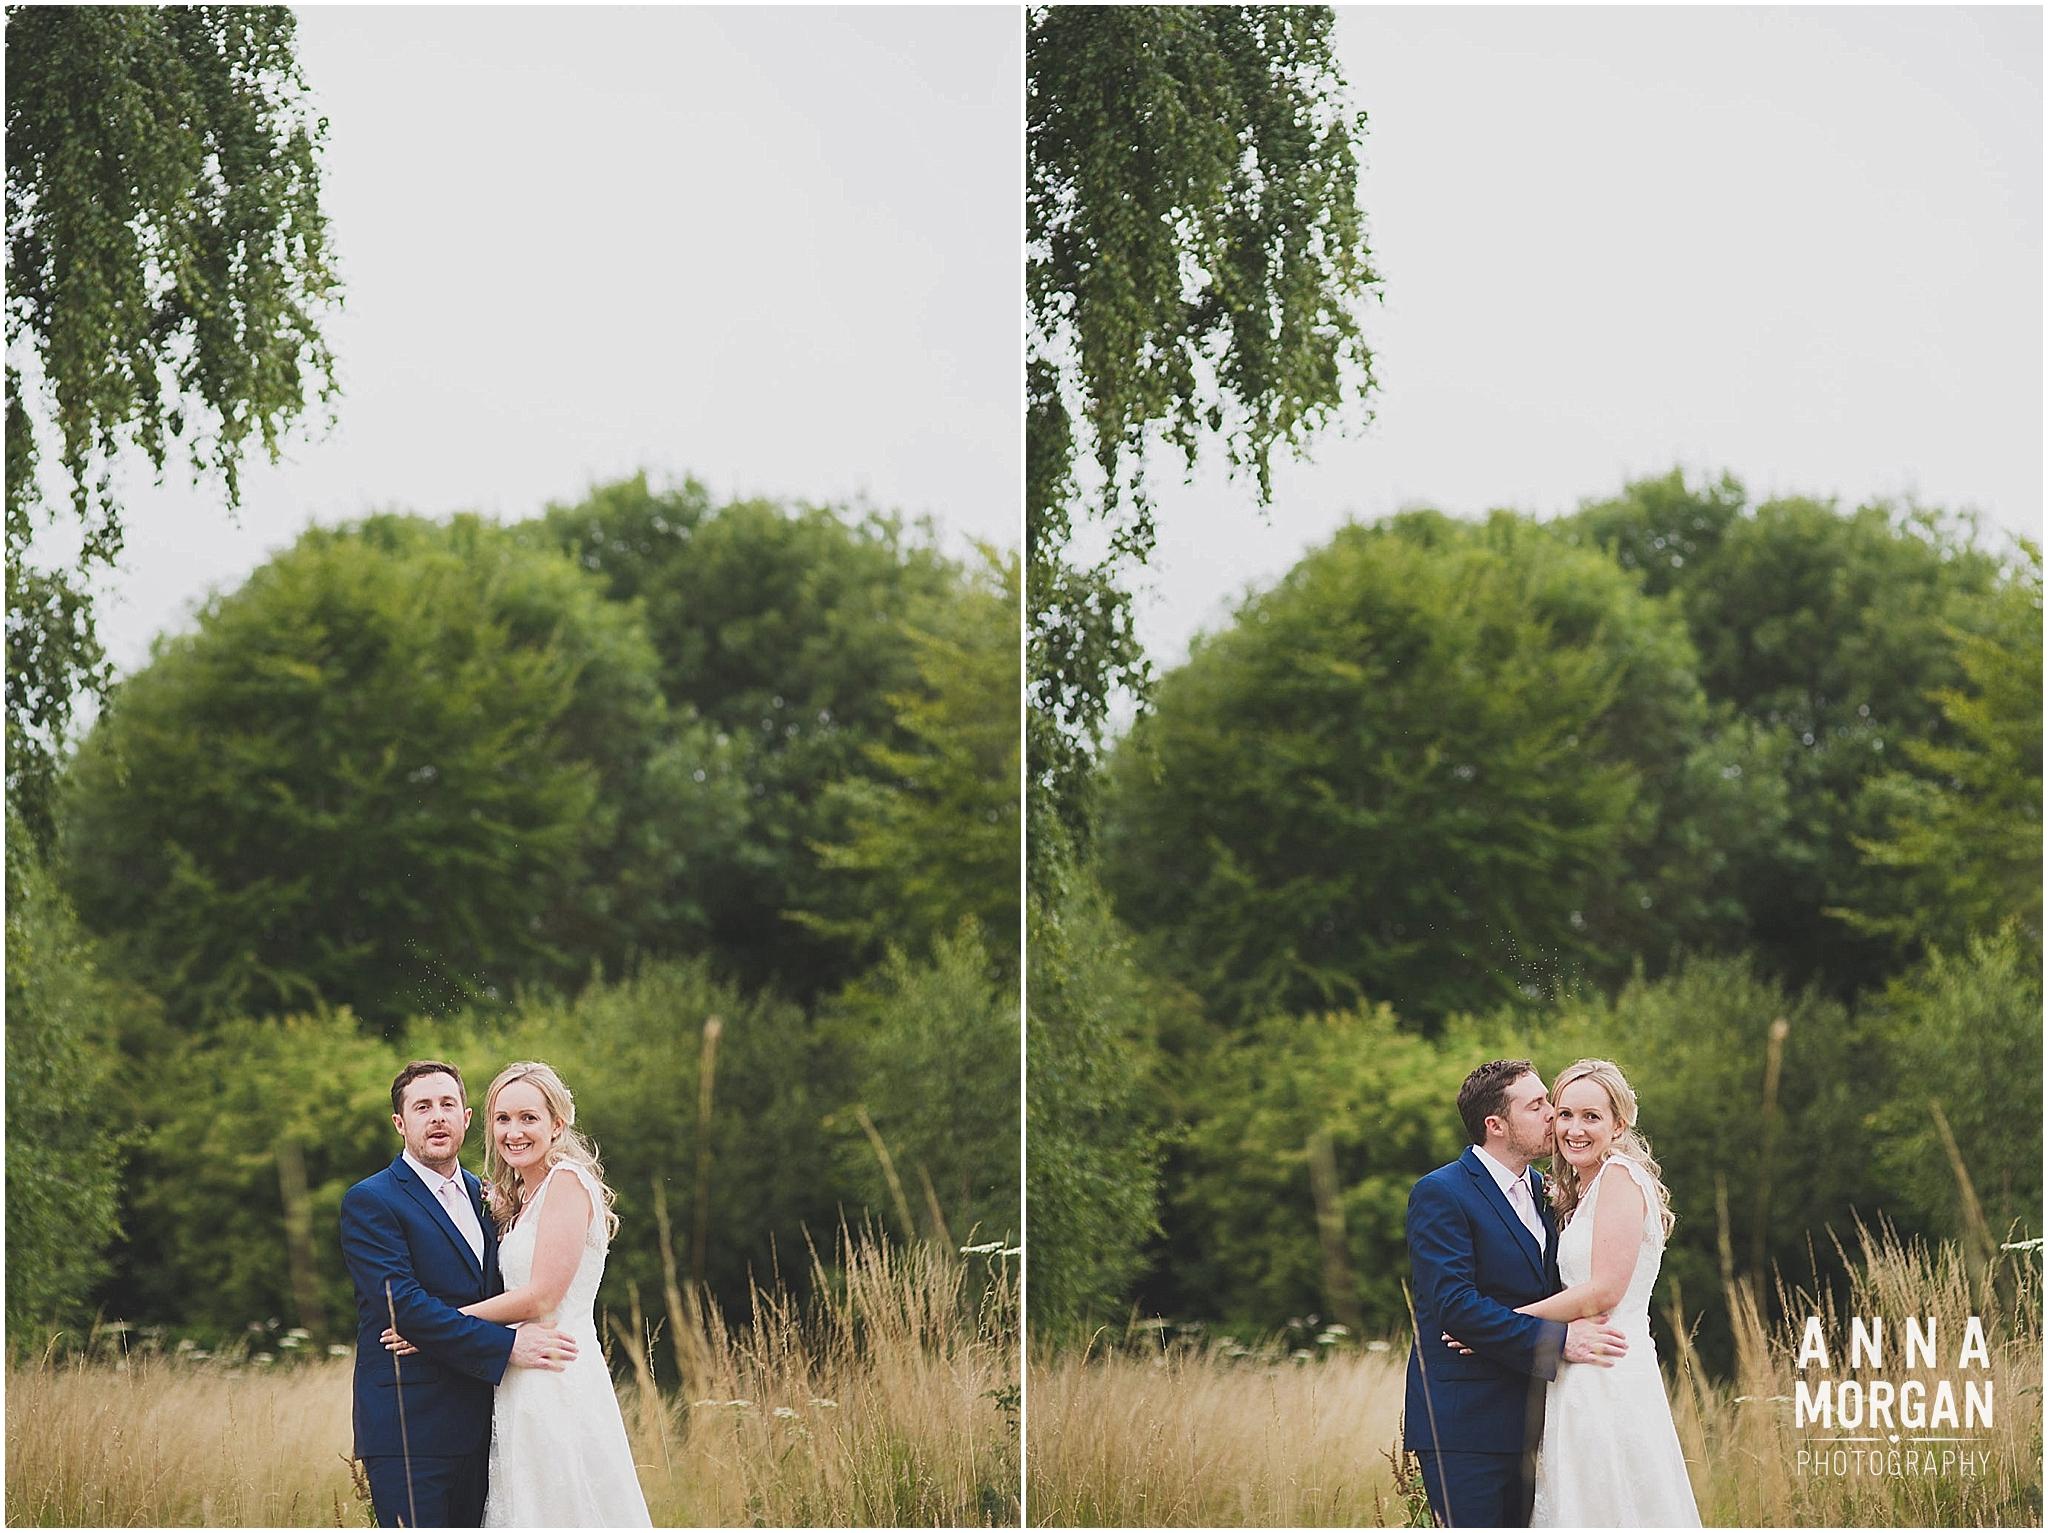 Horsebridge Station Wedding Becky & Freddie Anna Morgan Photography-42